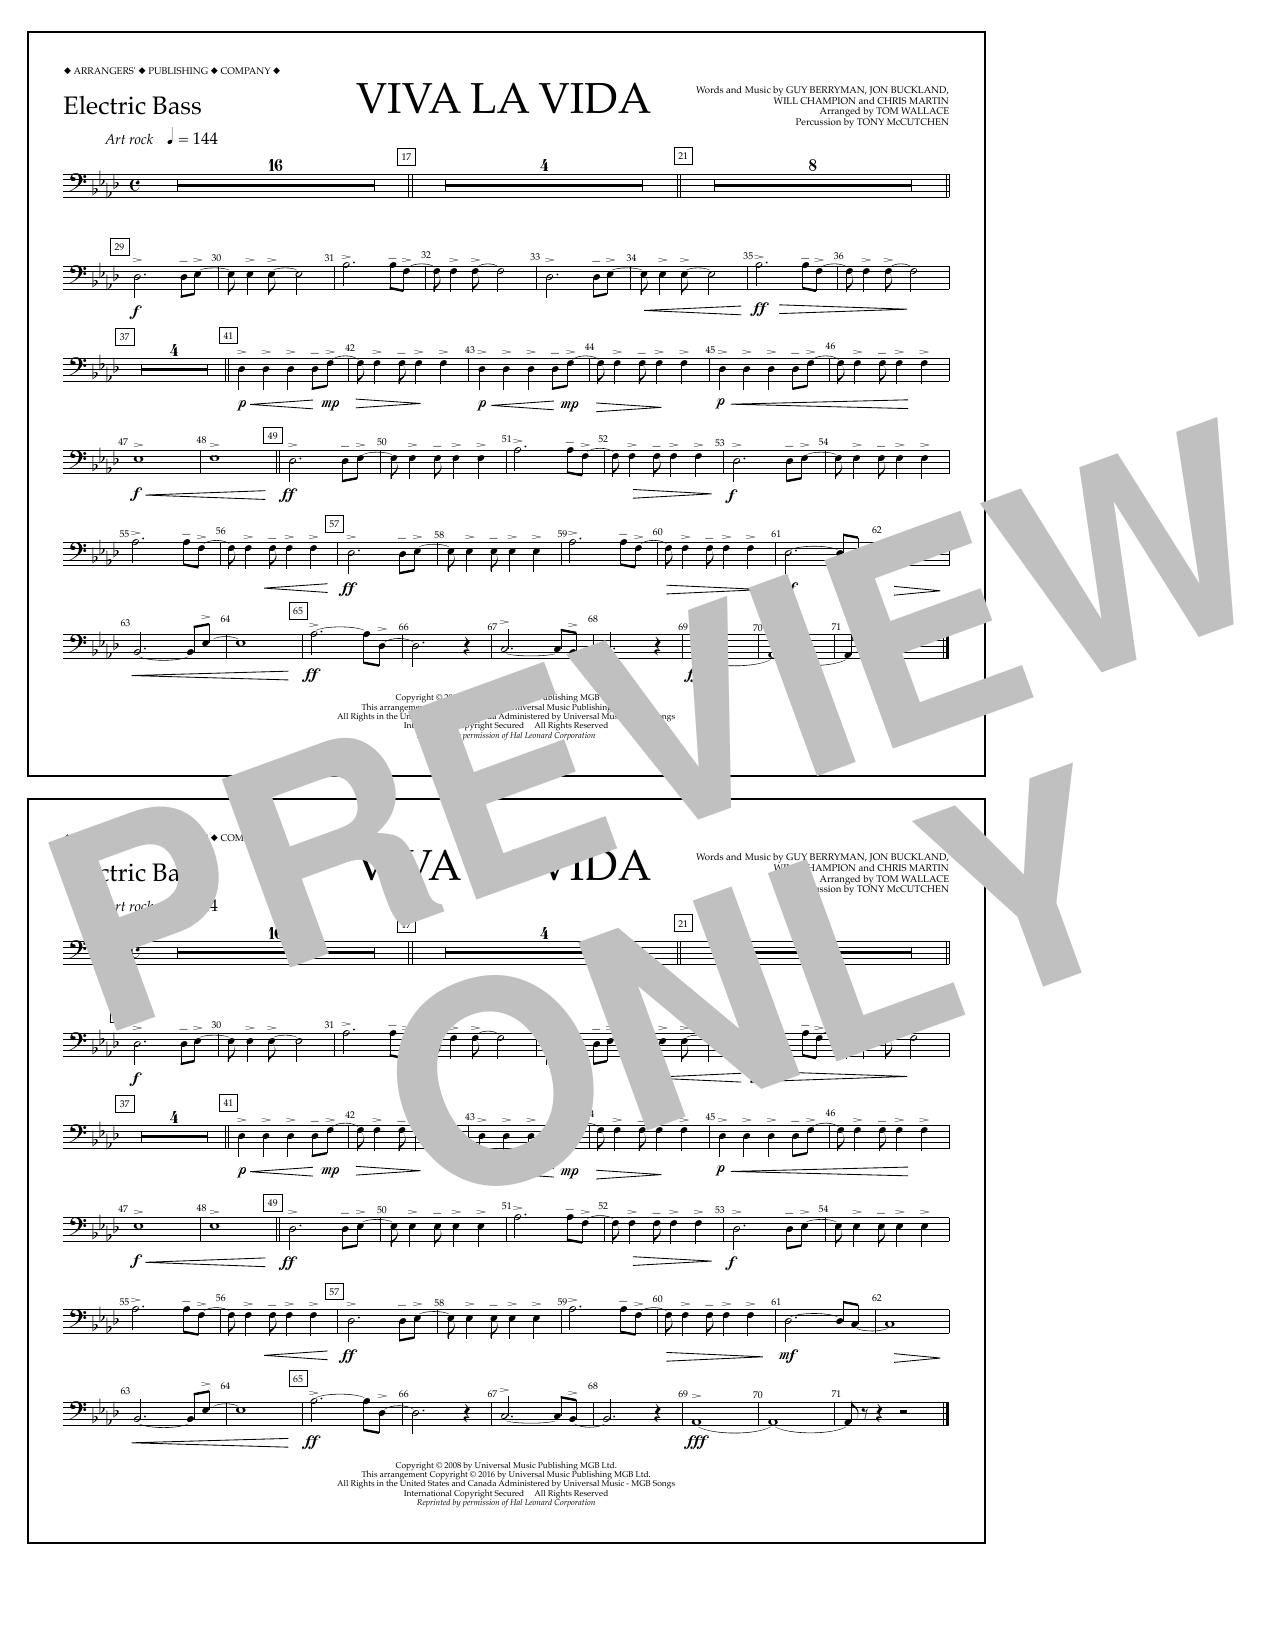 Tom Wallace Viva La Vida - Electric Bass sheet music notes and chords. Download Printable PDF.